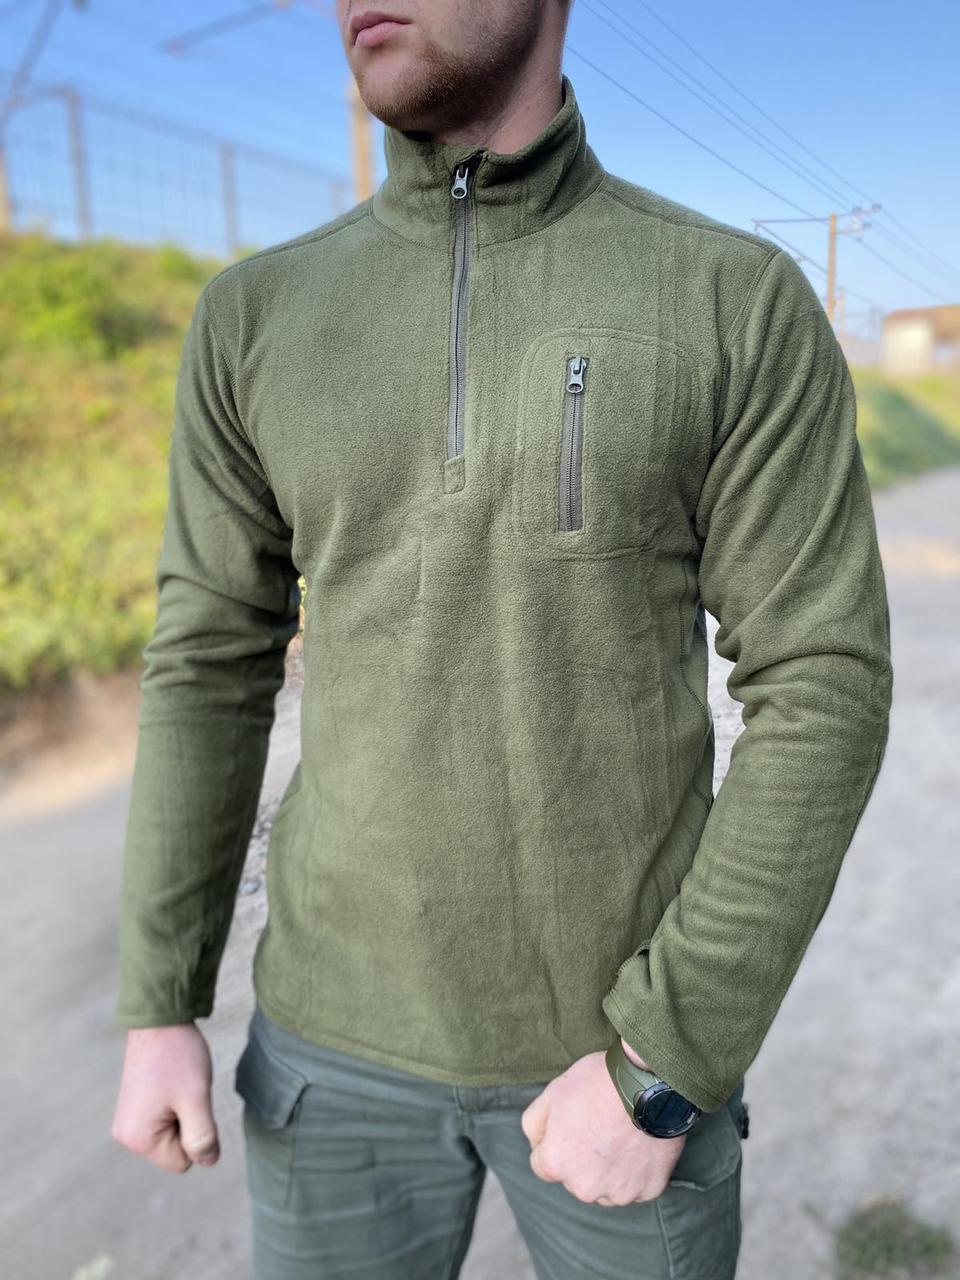 Пуловер реглан армейский, военный, для охоты и рыбалки теплый ESDY OLIVE